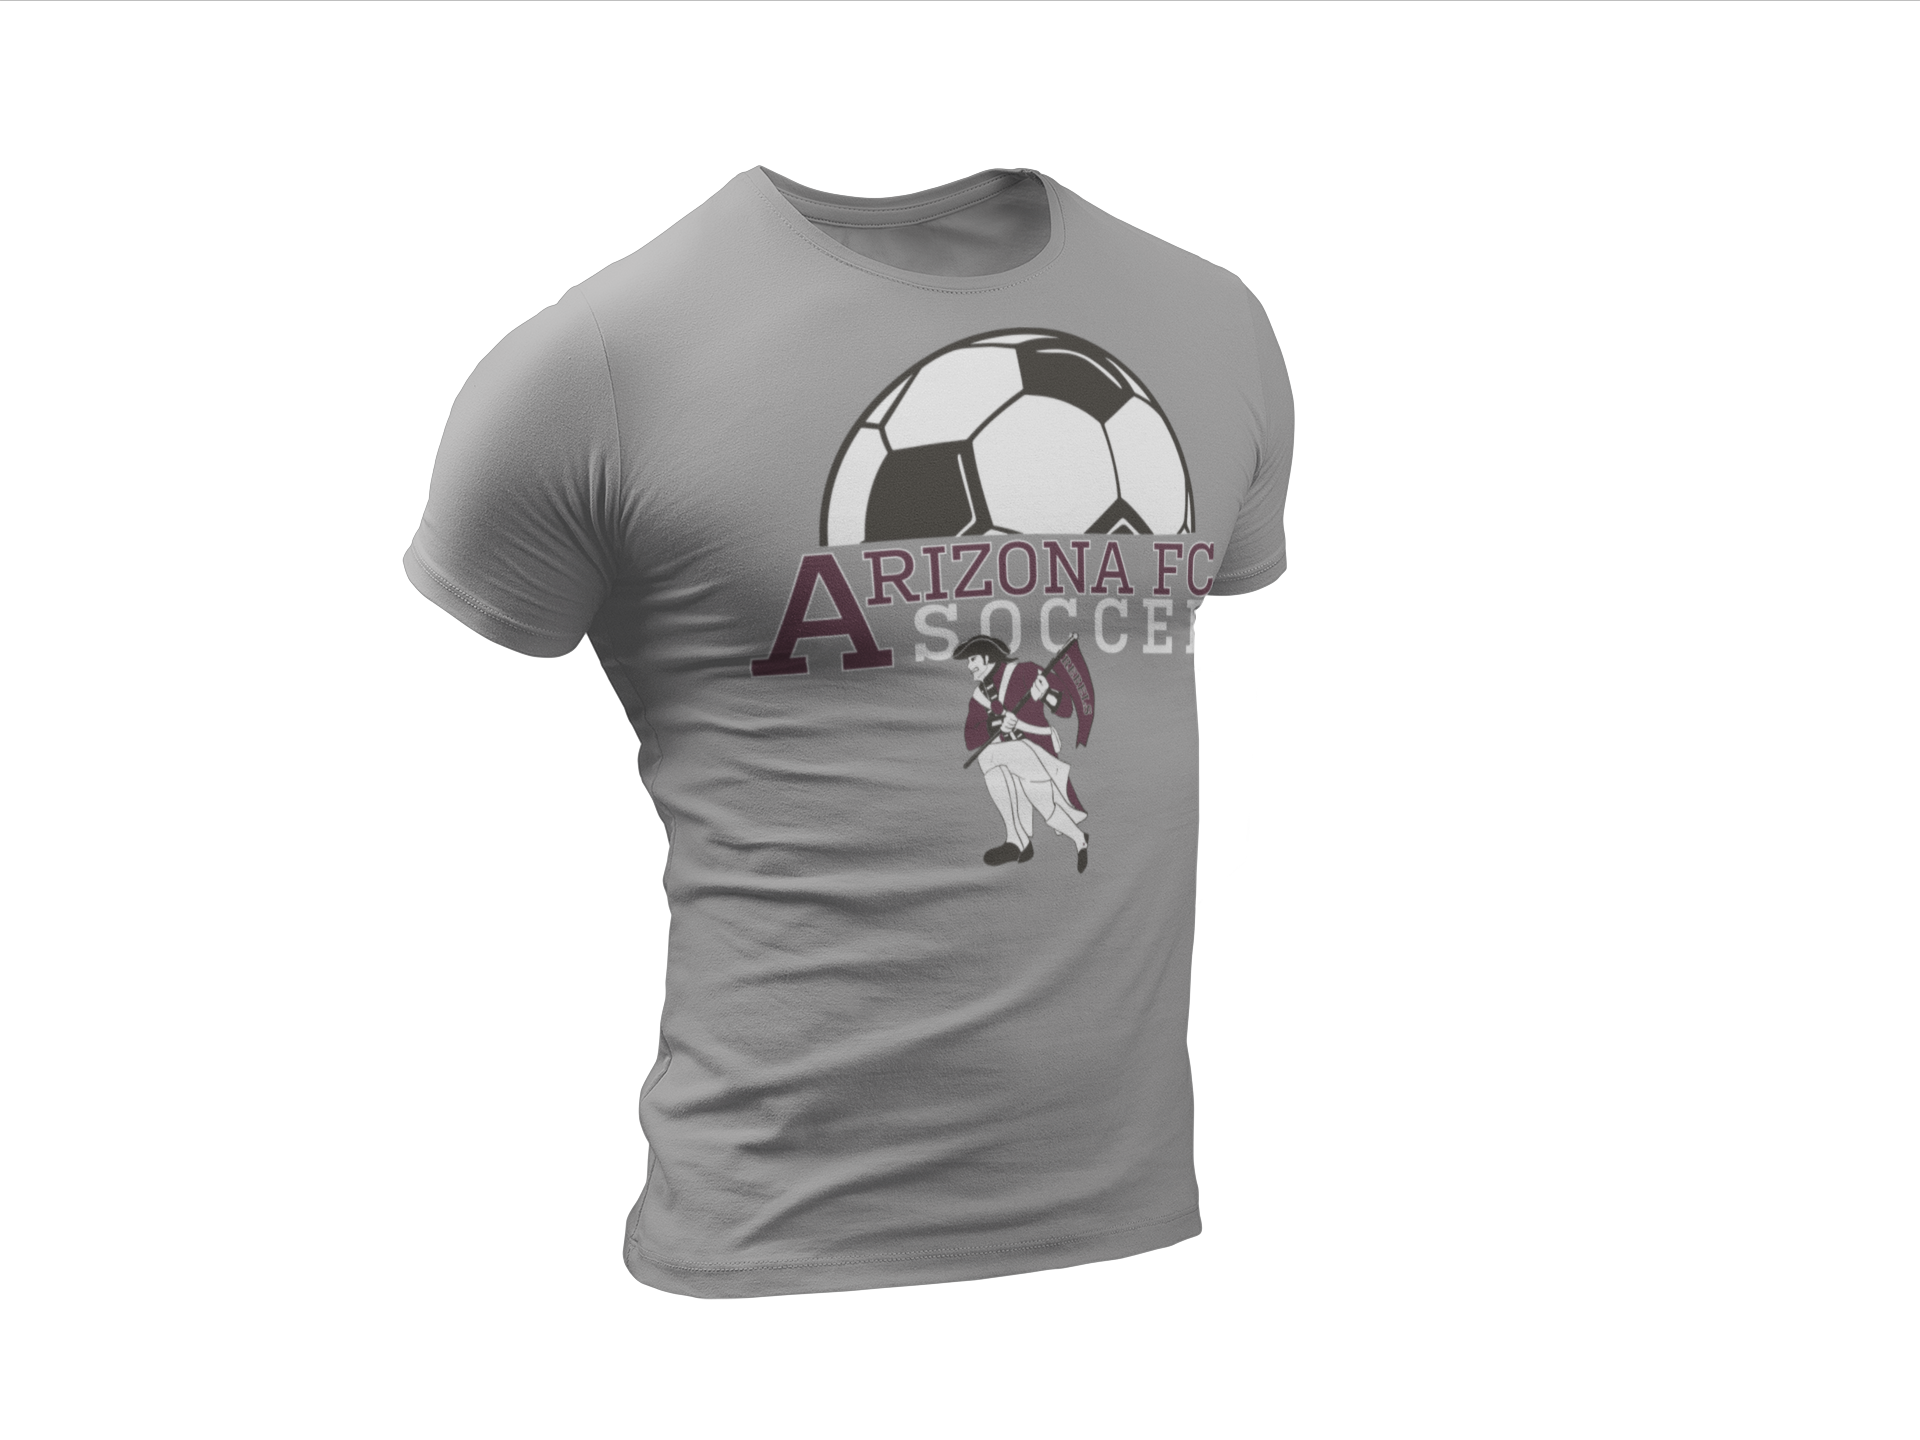 Arizona FC Soccer 00007